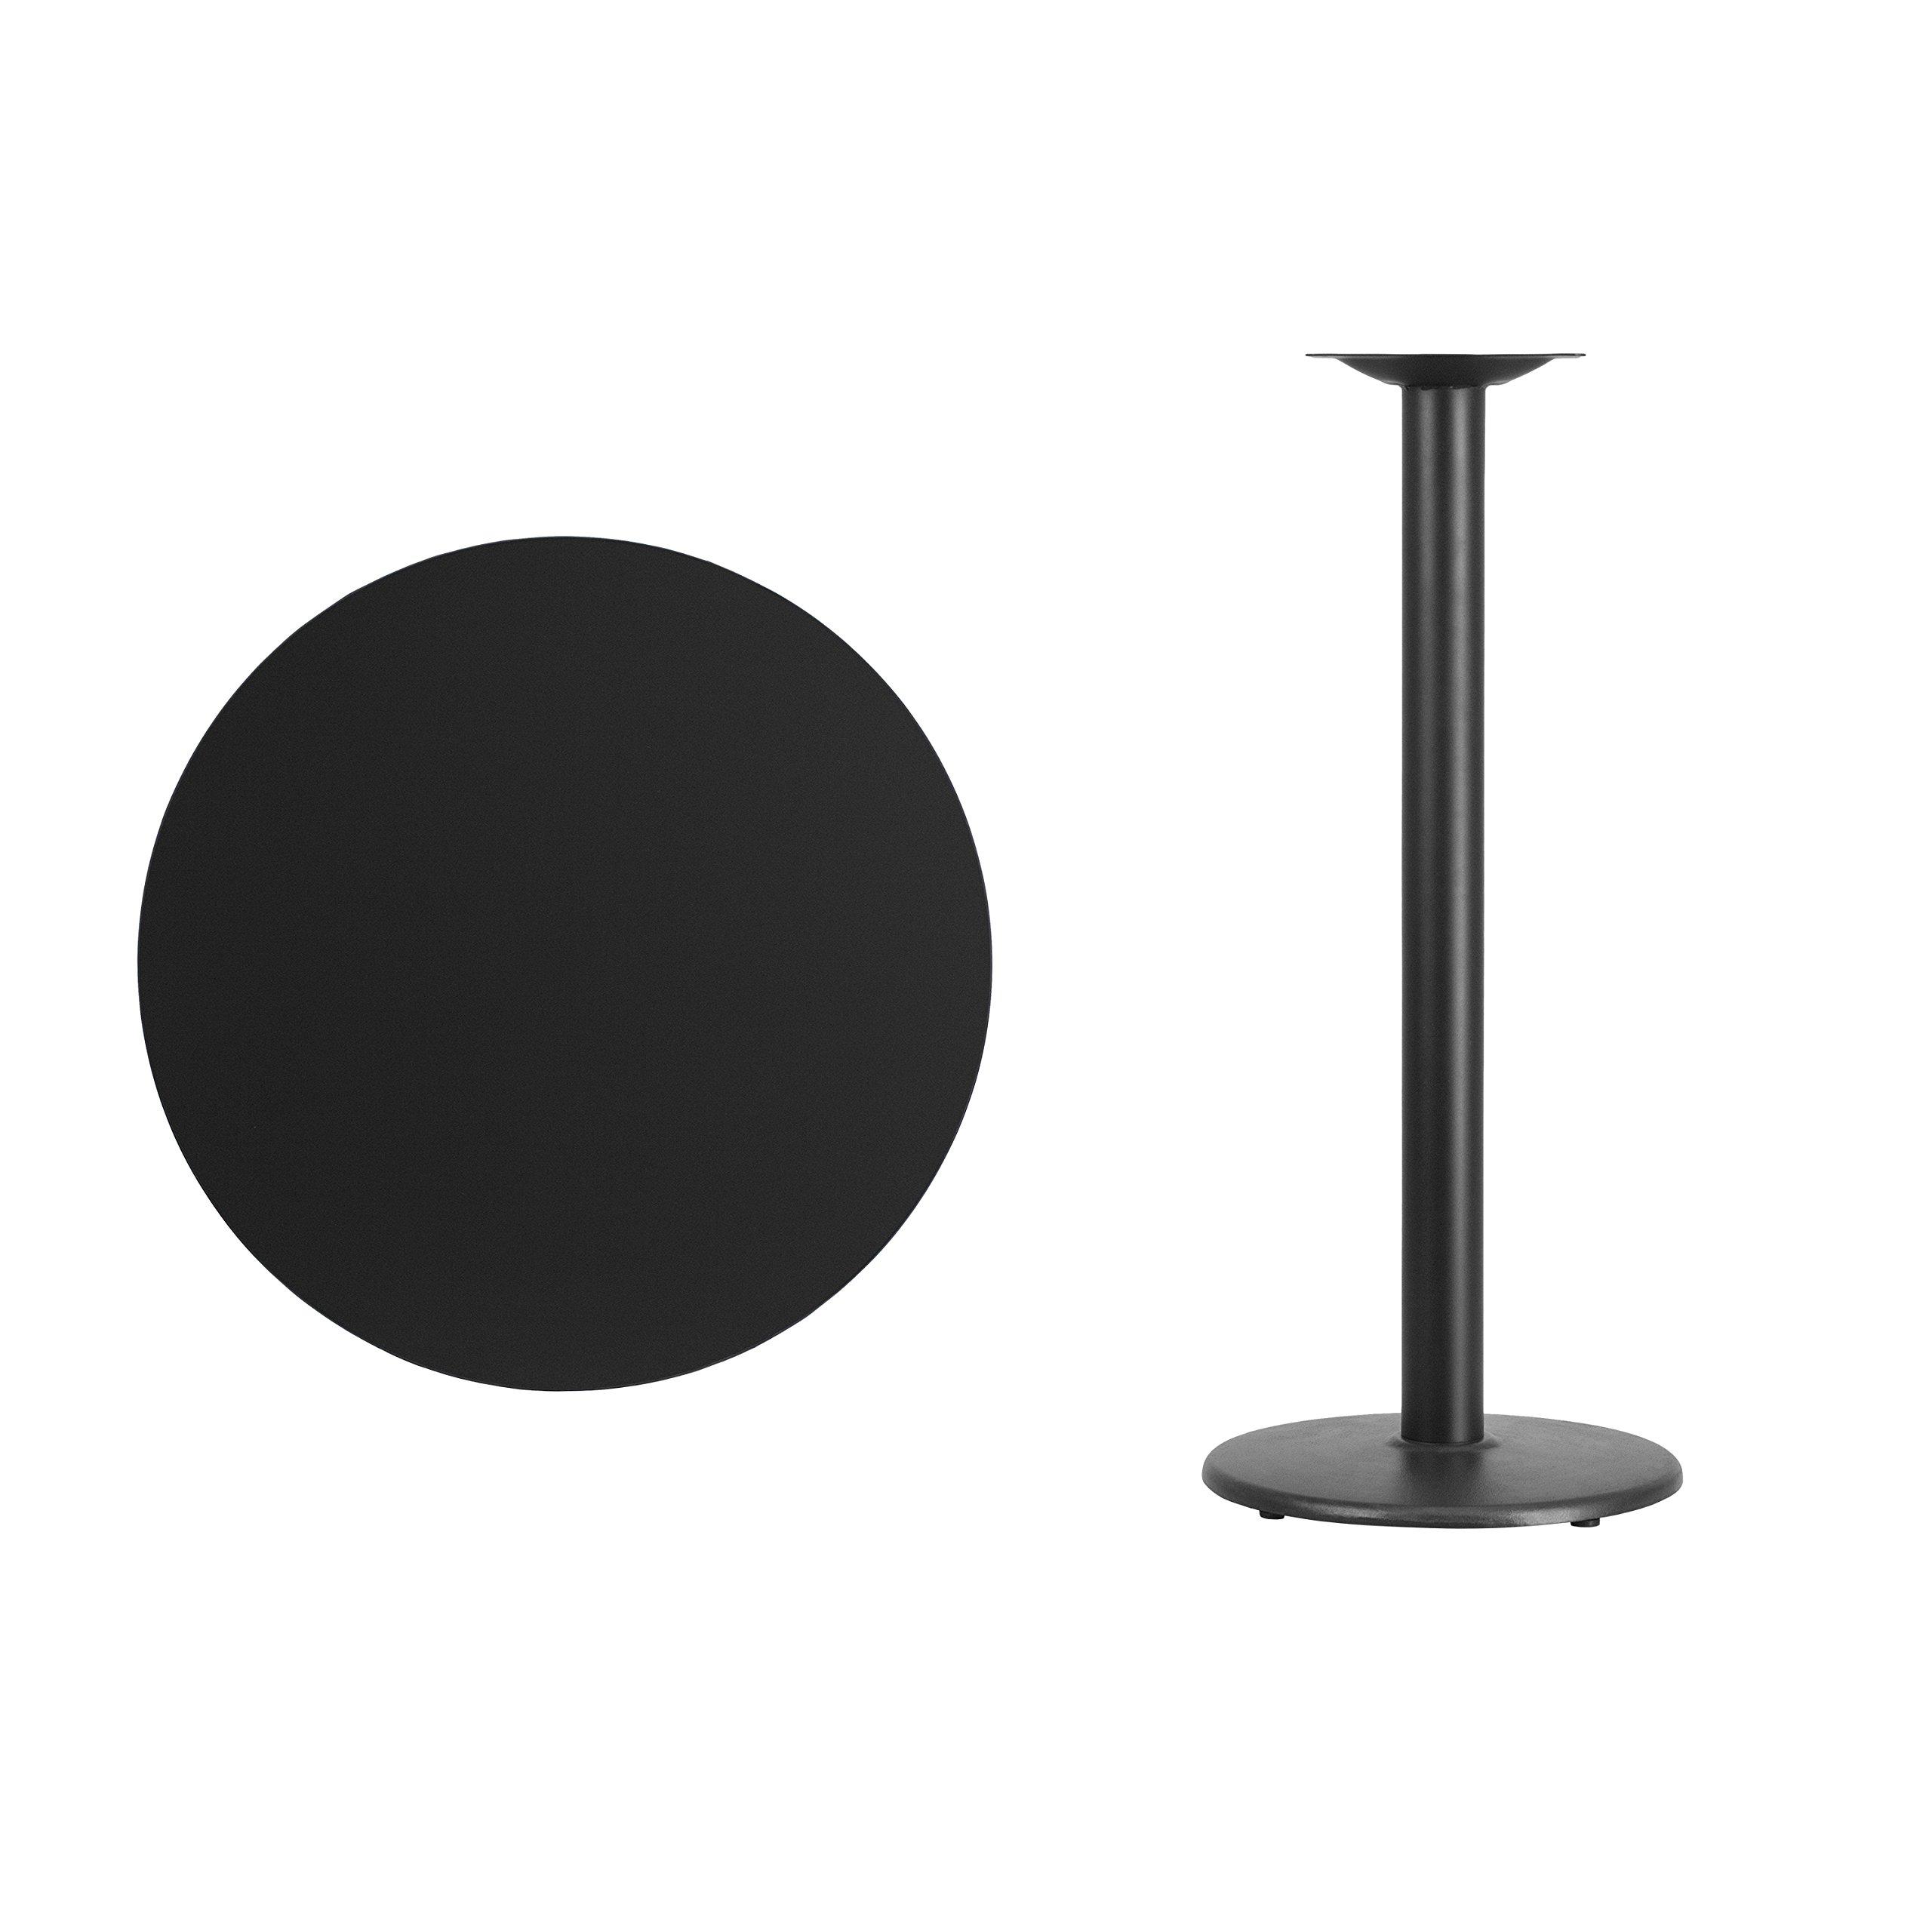 Flash Furniture 30'' Round Black Laminate Table Top with 18'' Round Bar Height Table Base by Flash Furniture